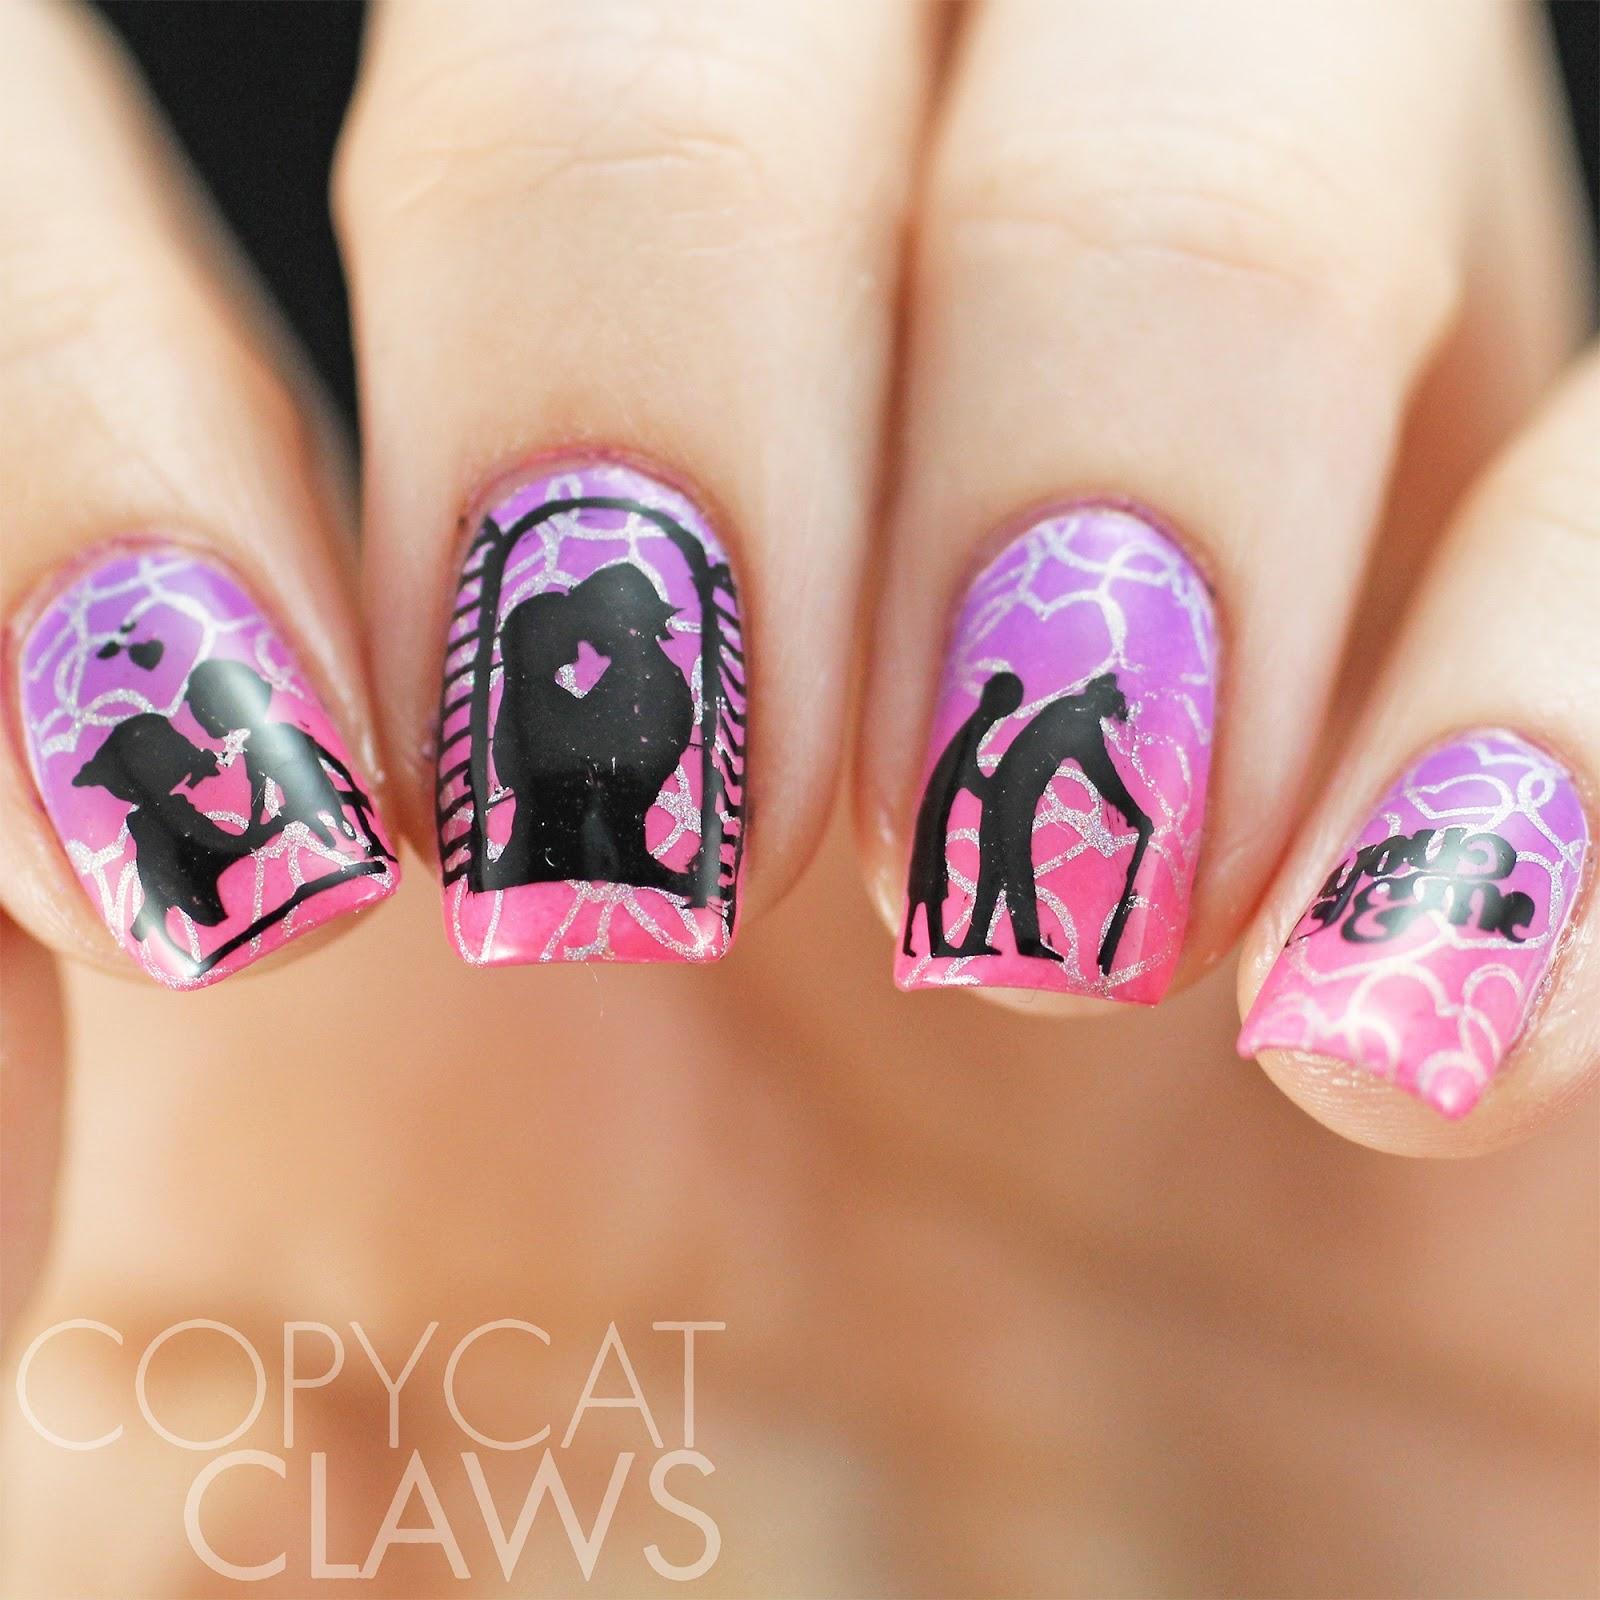 Copycat Claws: 40 Great Nail Art Ideas - Love